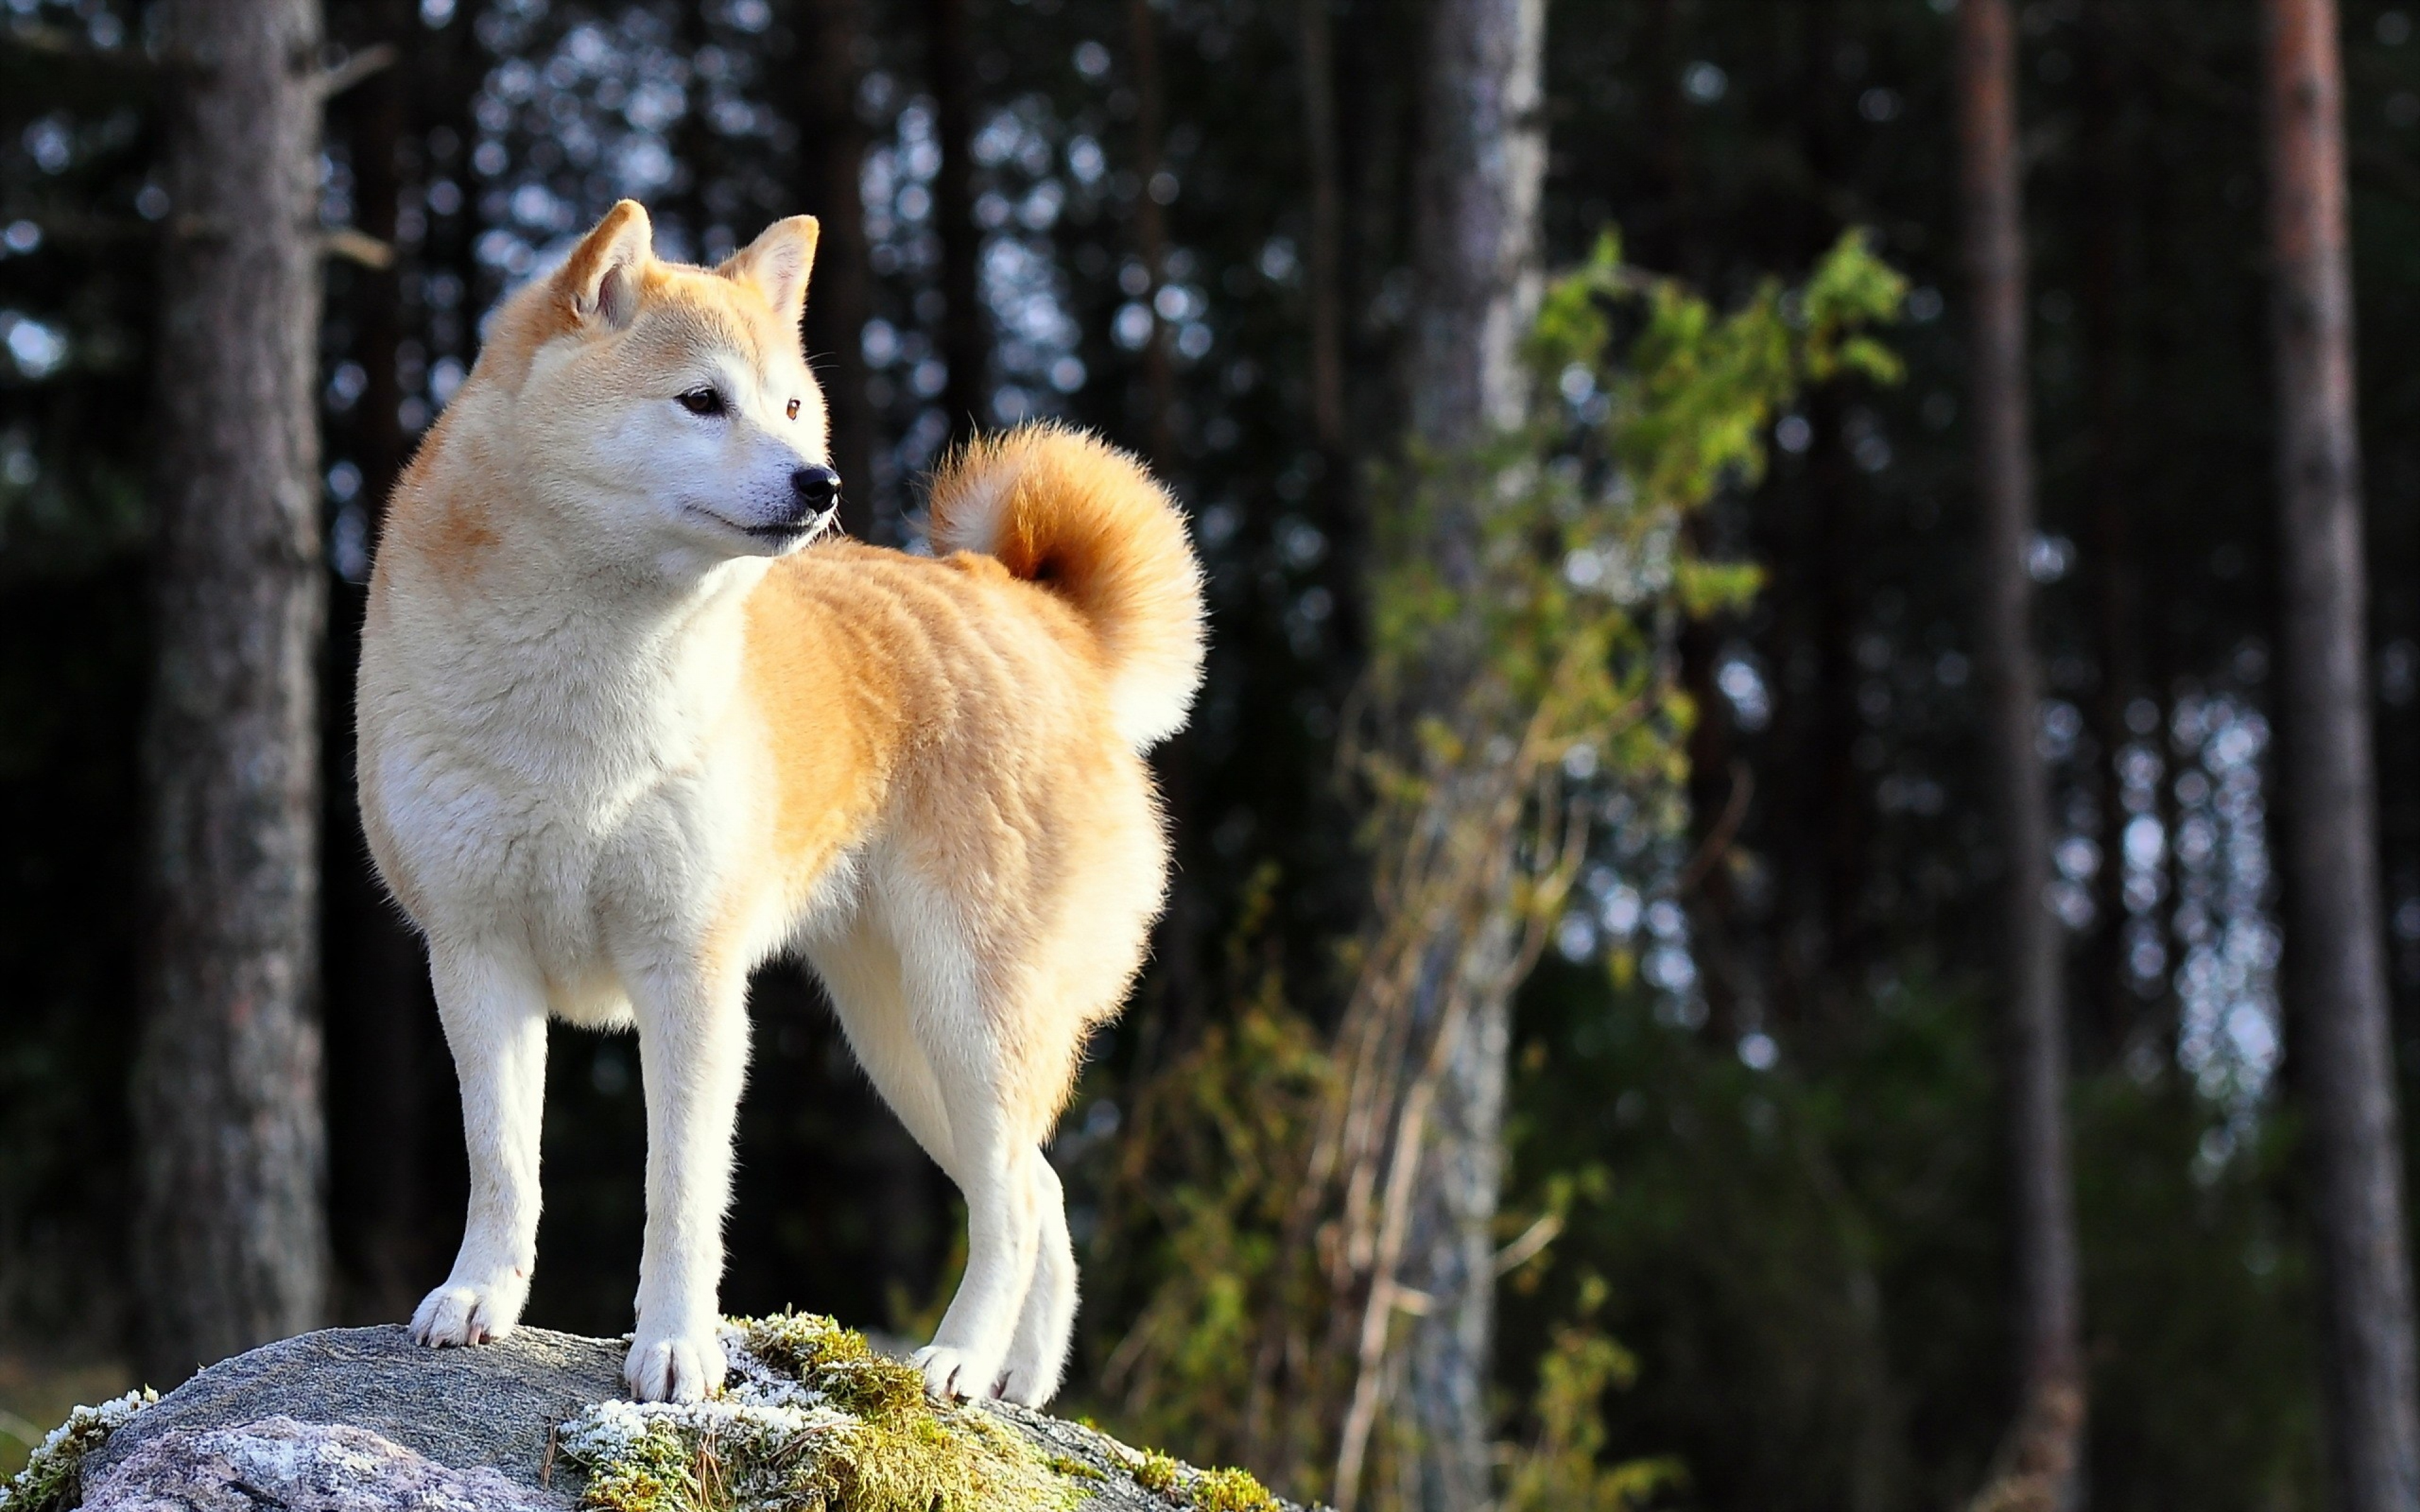 Beautiful Akita dog Desktop background Images Animals And Birds 3840x2400